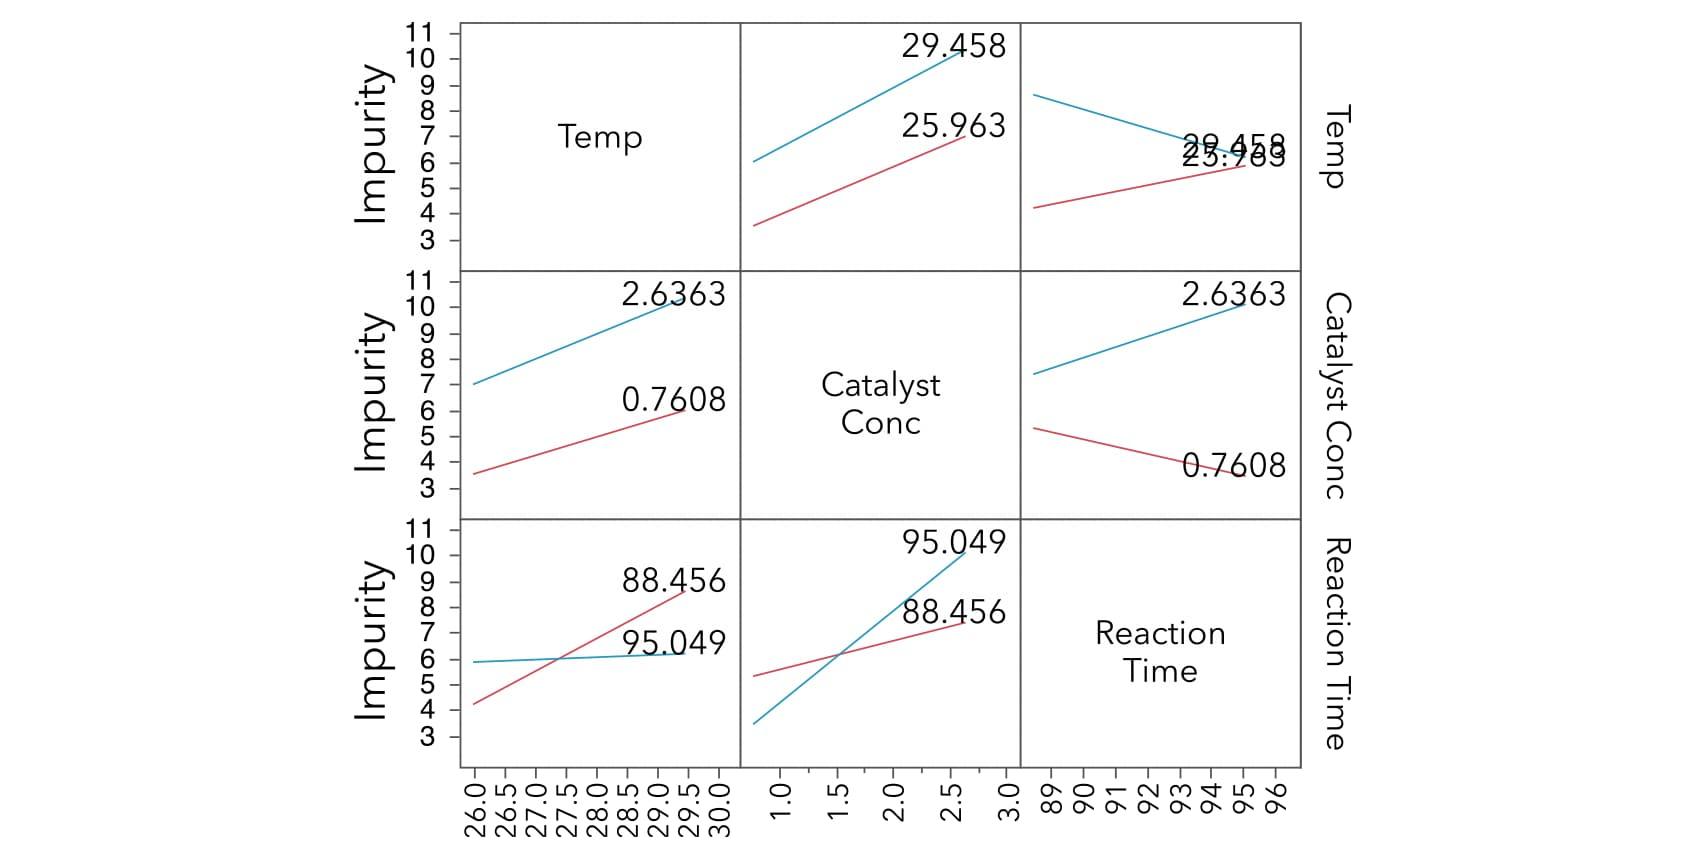 mlr-interactions-interaction-plot